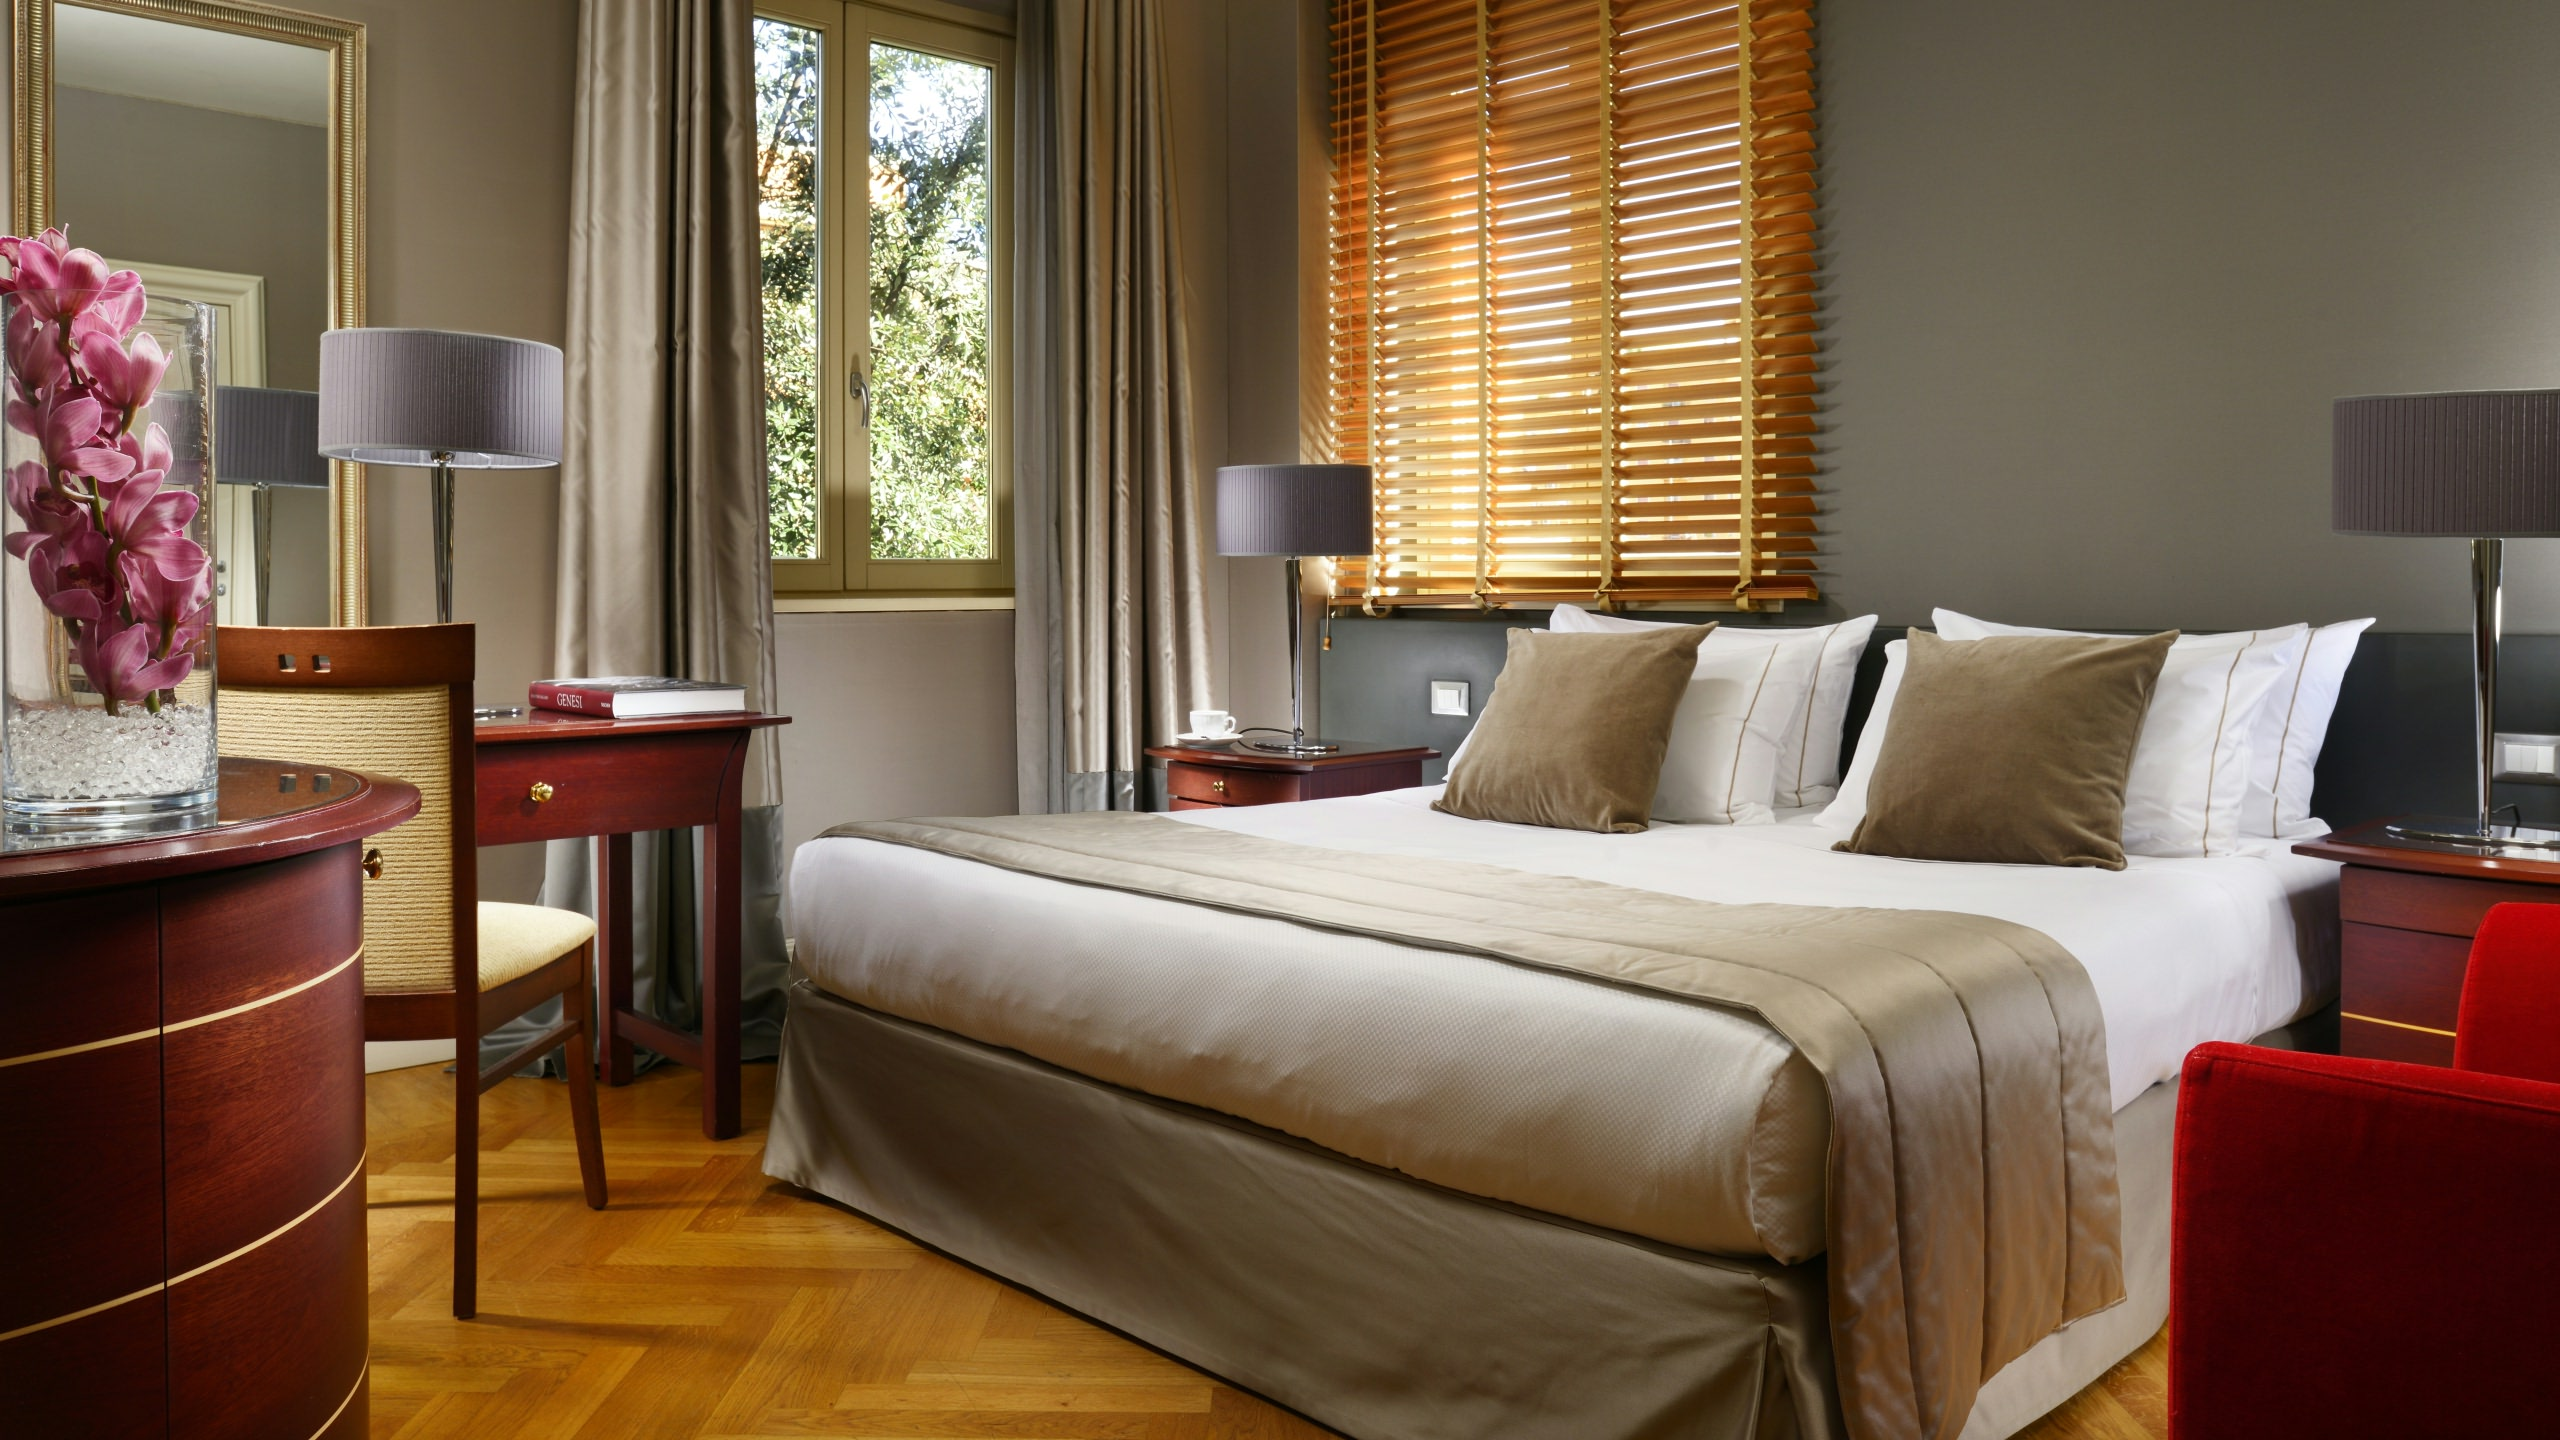 hotel-principe-torlonia-rooms-04